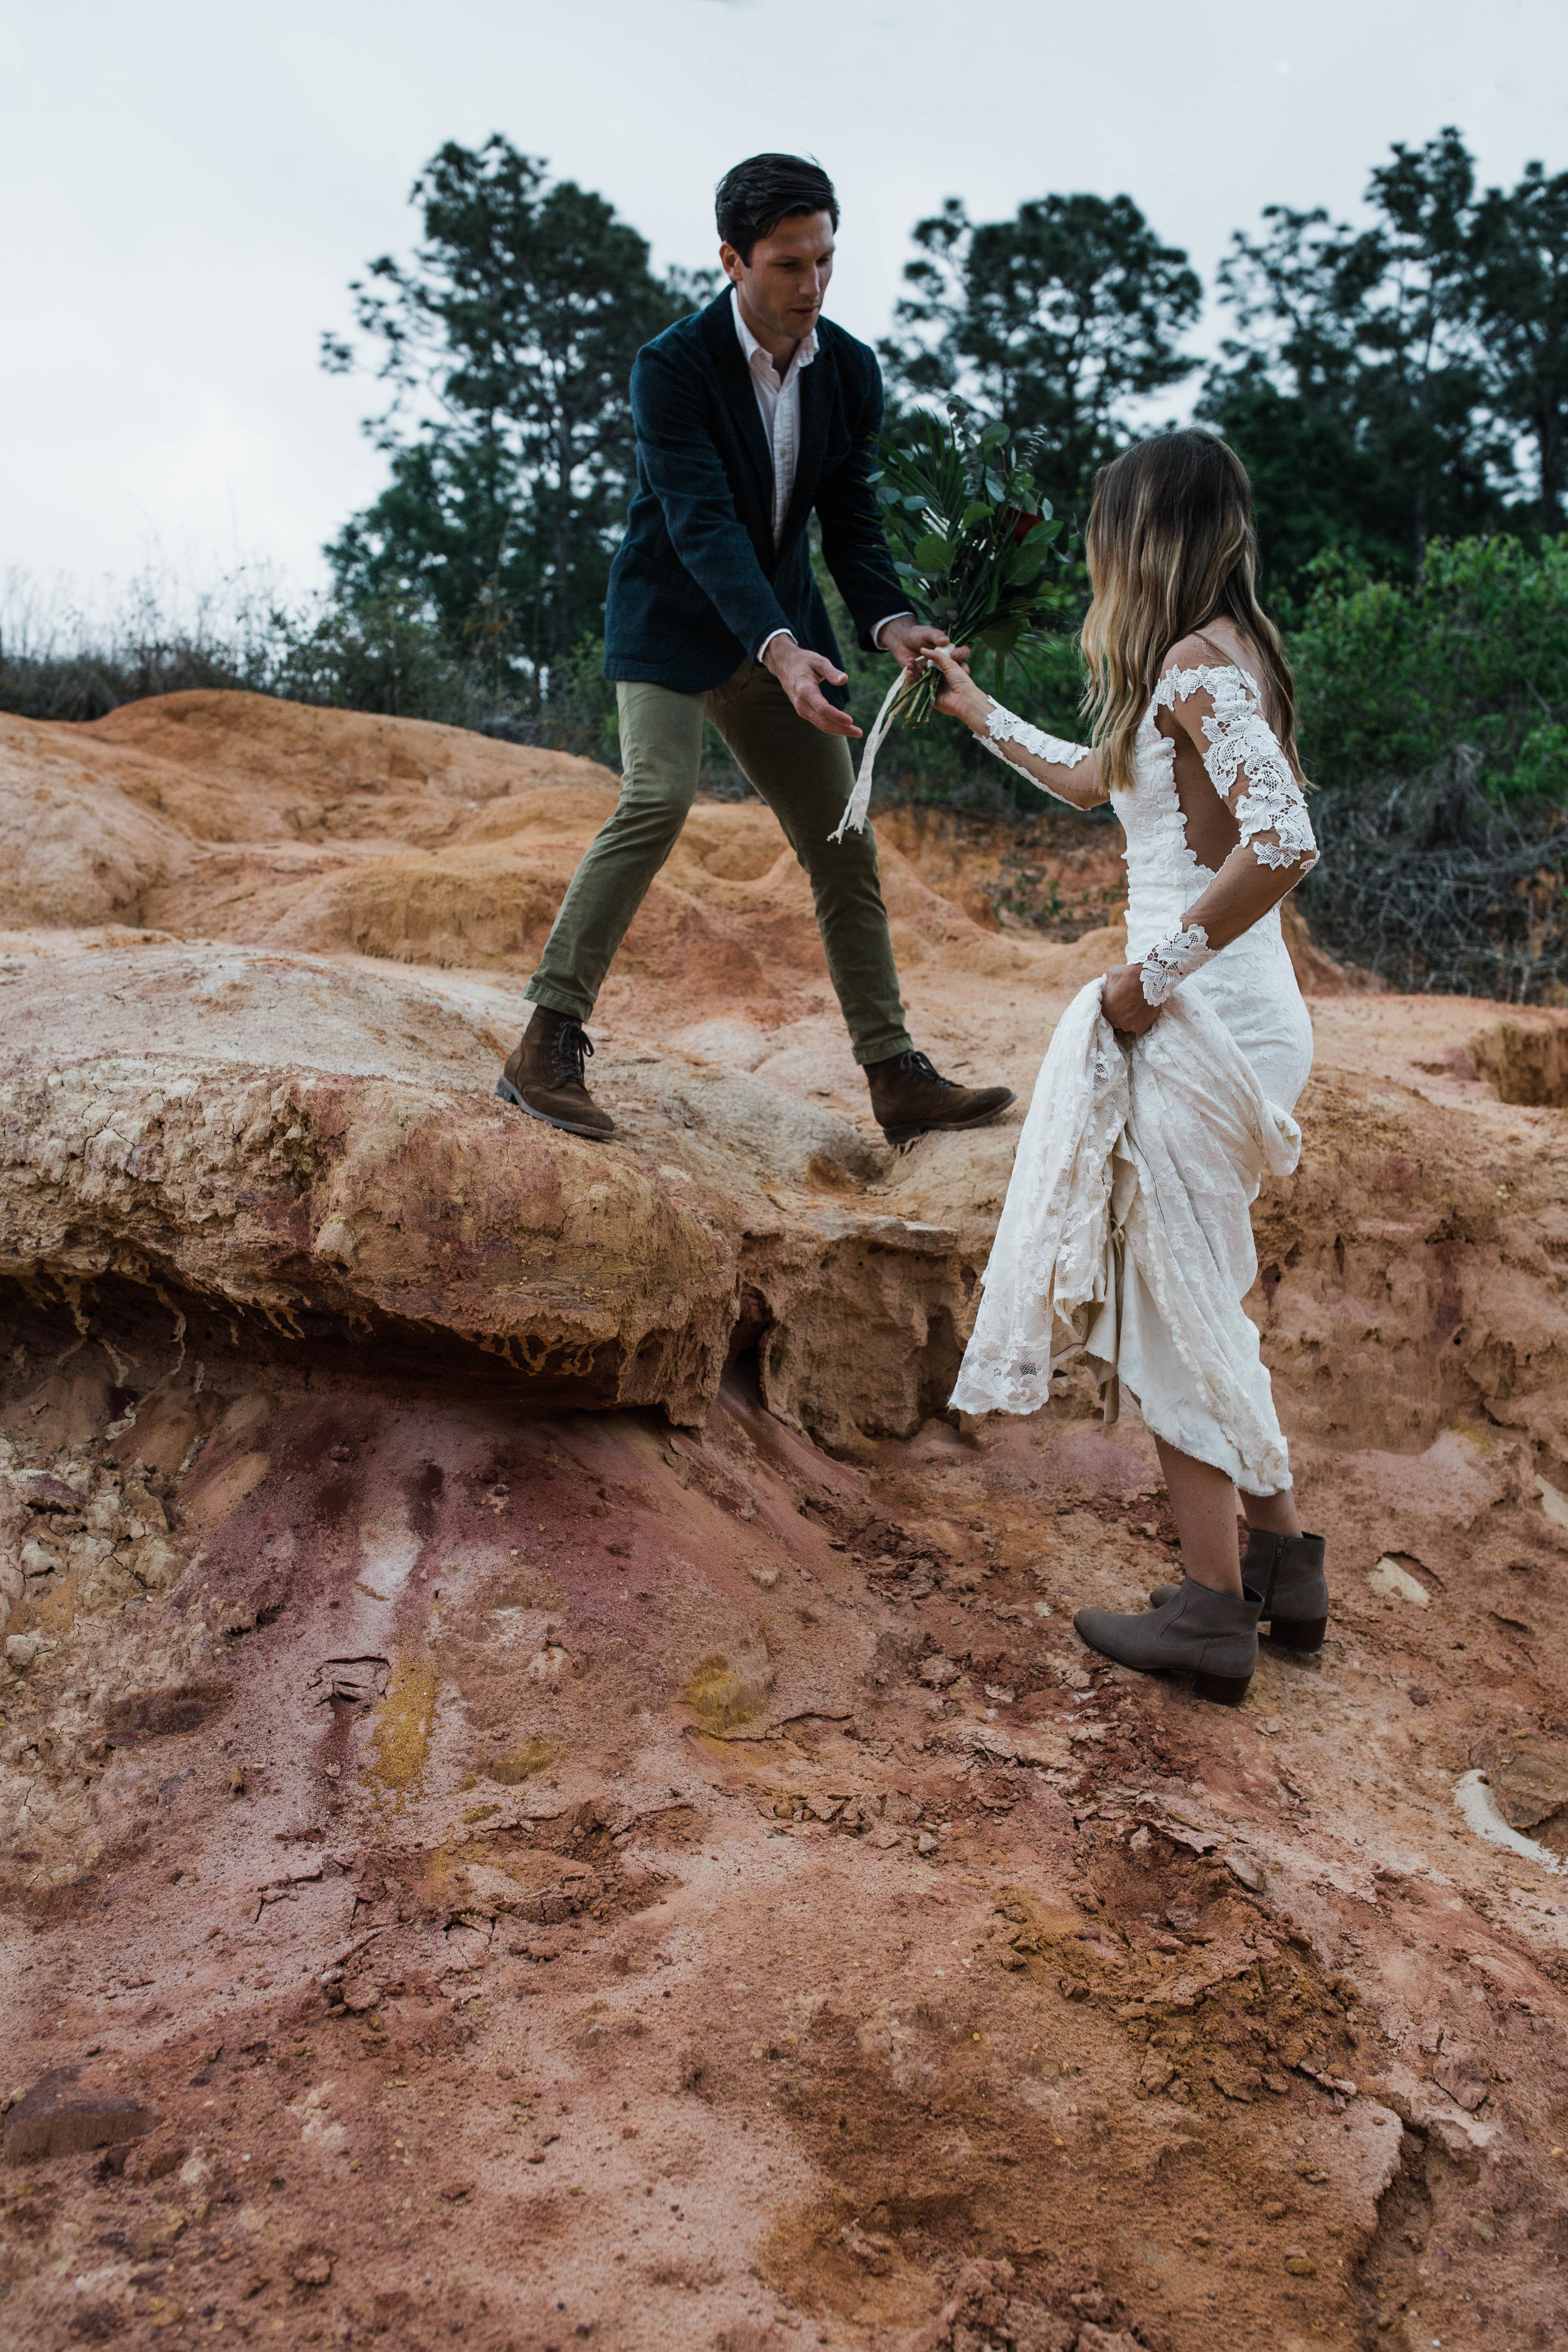 You wouldn't believe this desert adventure elopement is shot in Florida